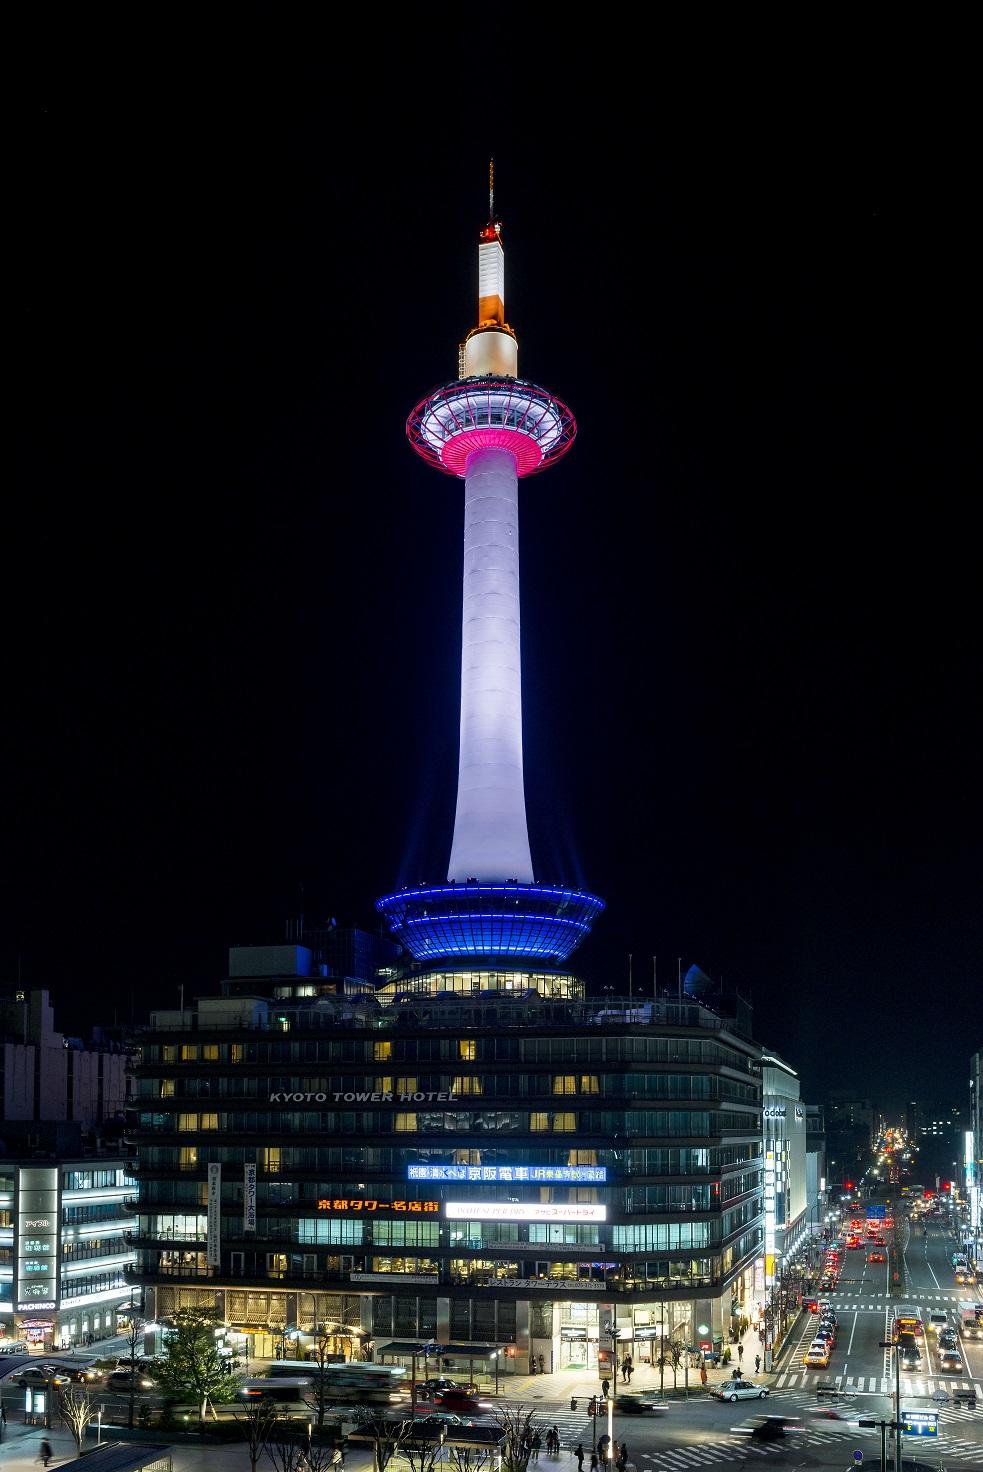 kyoto_tower_01リリース用